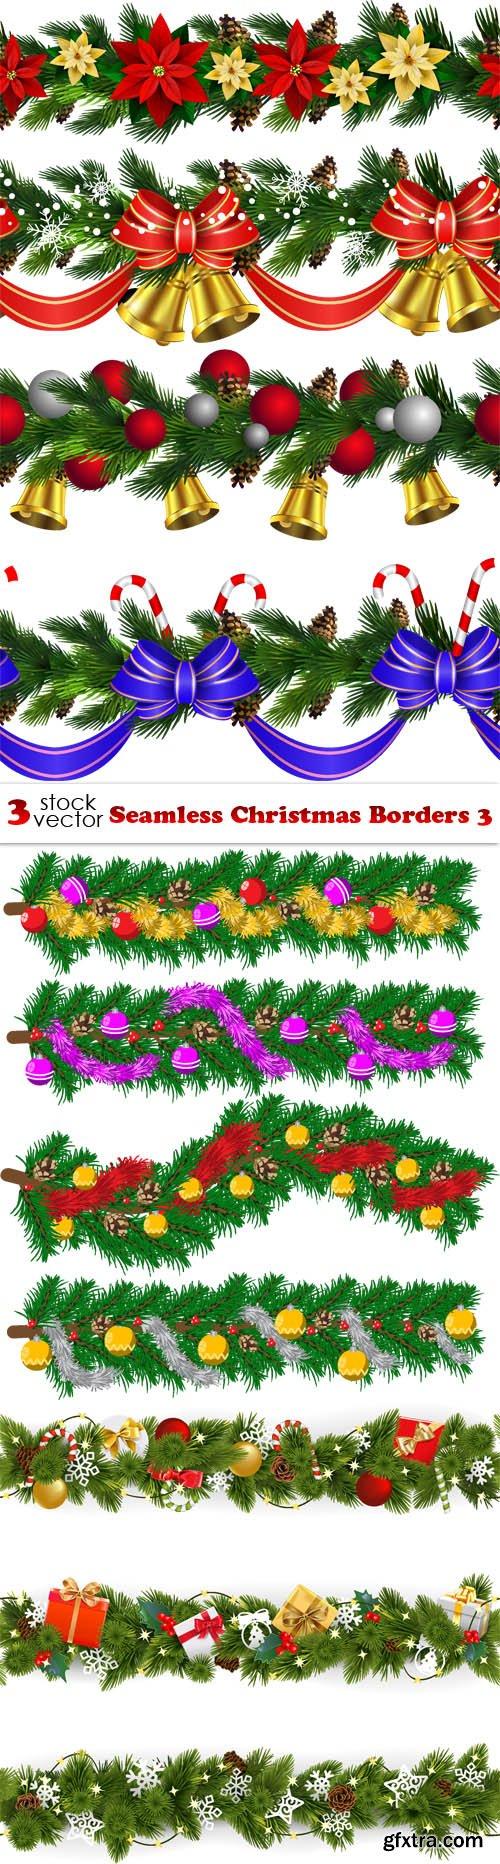 Vectors - Seamless Christmas Borders 3